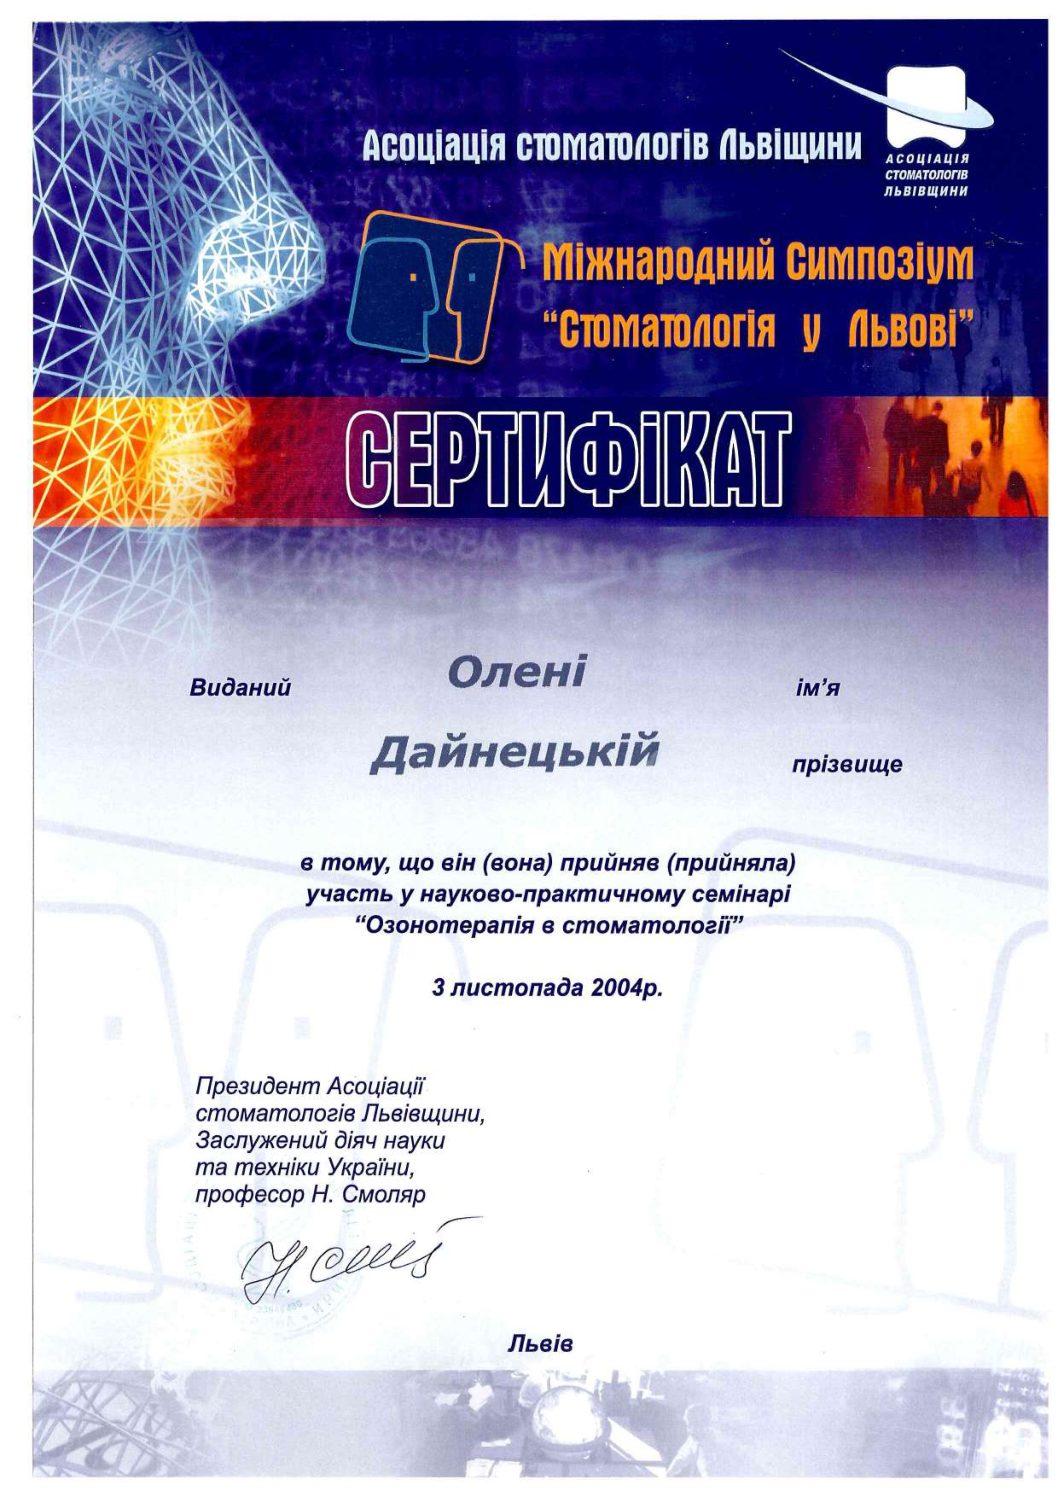 Untitled.FR34.tif compressed pdf - Олена Дайнецька